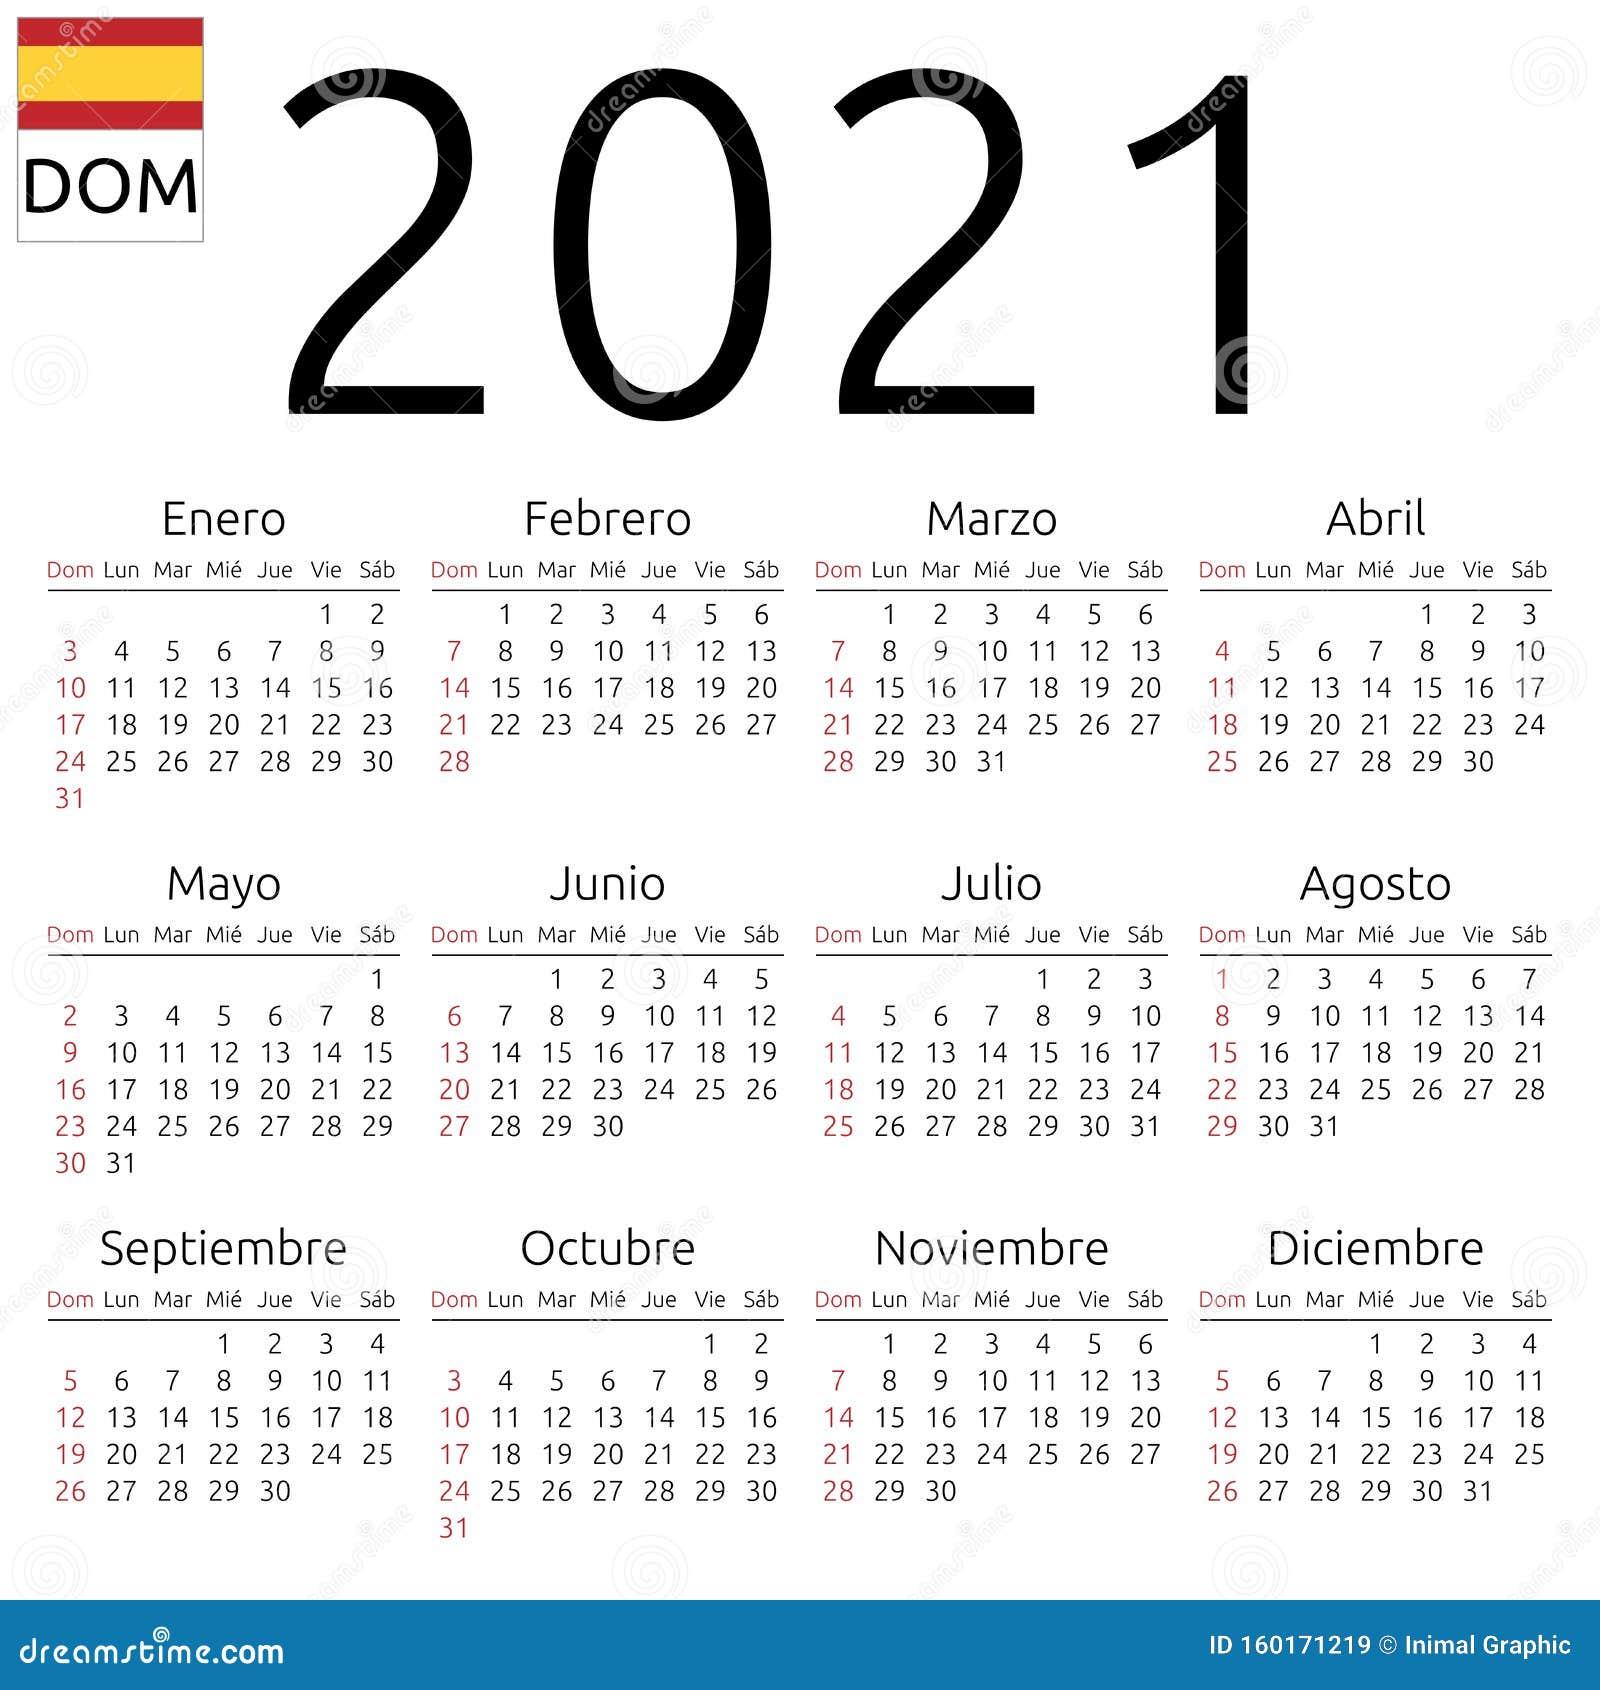 Calendrier Espagnol 2021 Calendrier 2021, Espagnol, Dimanche Illustration de Vecteur